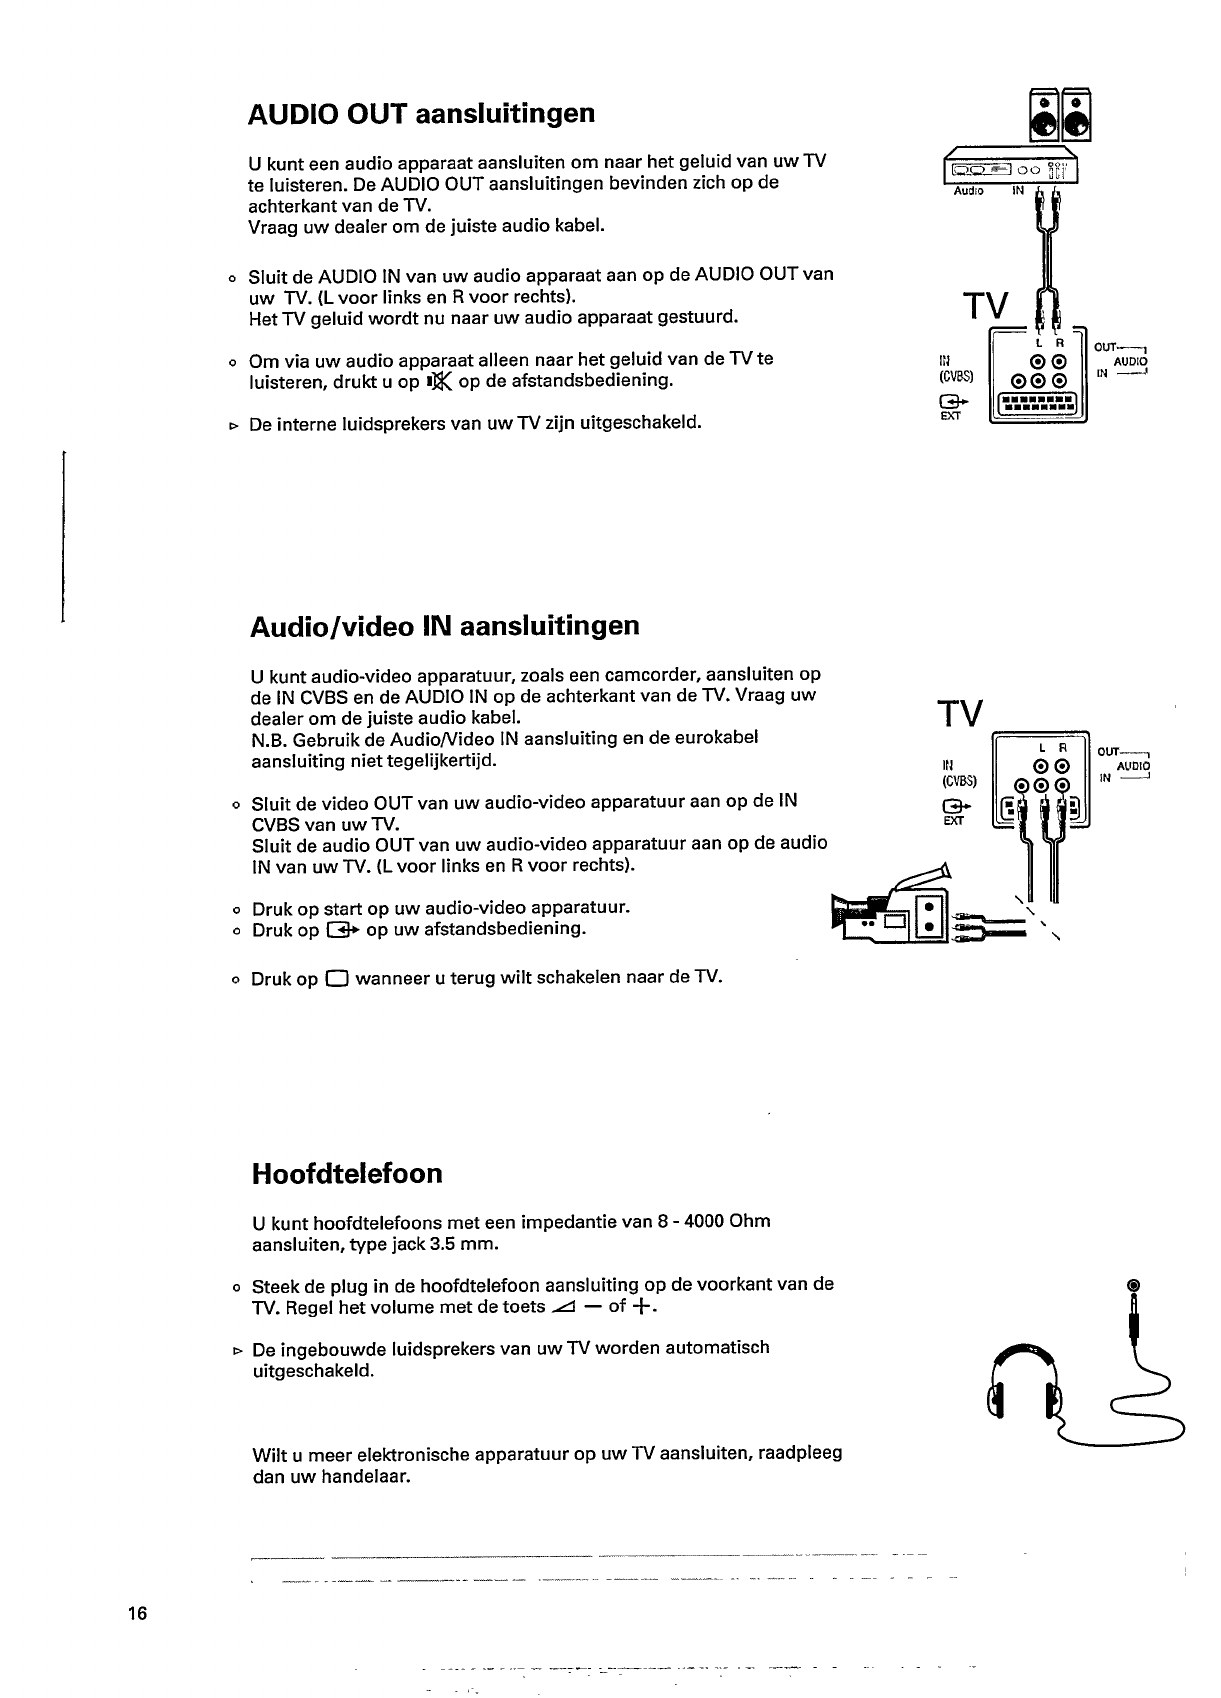 Bloeddruk Handmatig Opnemen Manual Guide